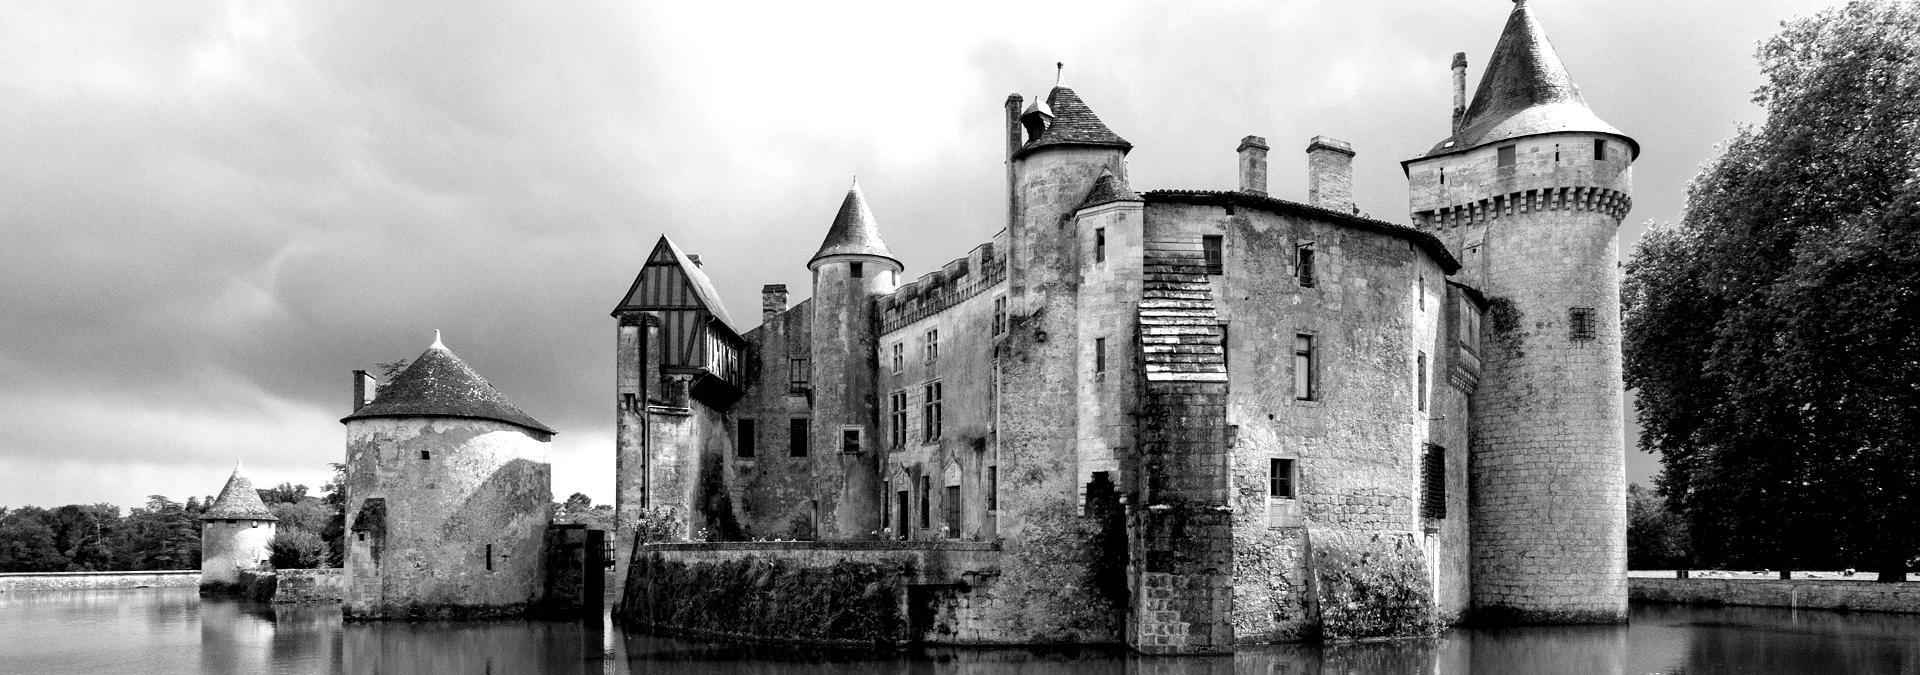 Chateau_de_La_Brede-blackwhite